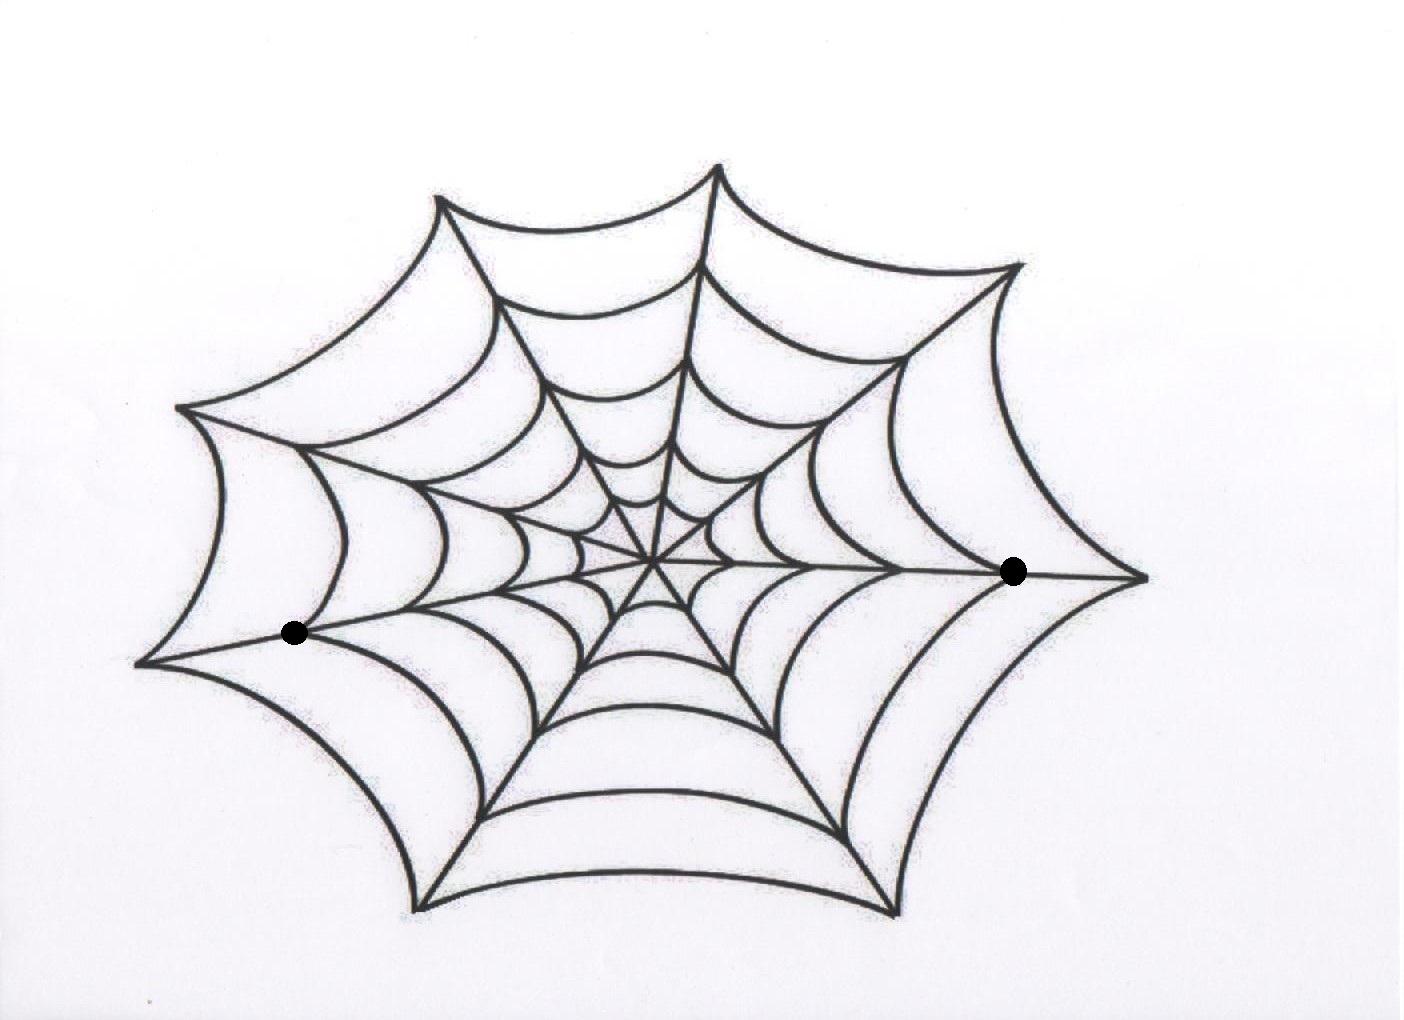 Plástica: Portero de arañas